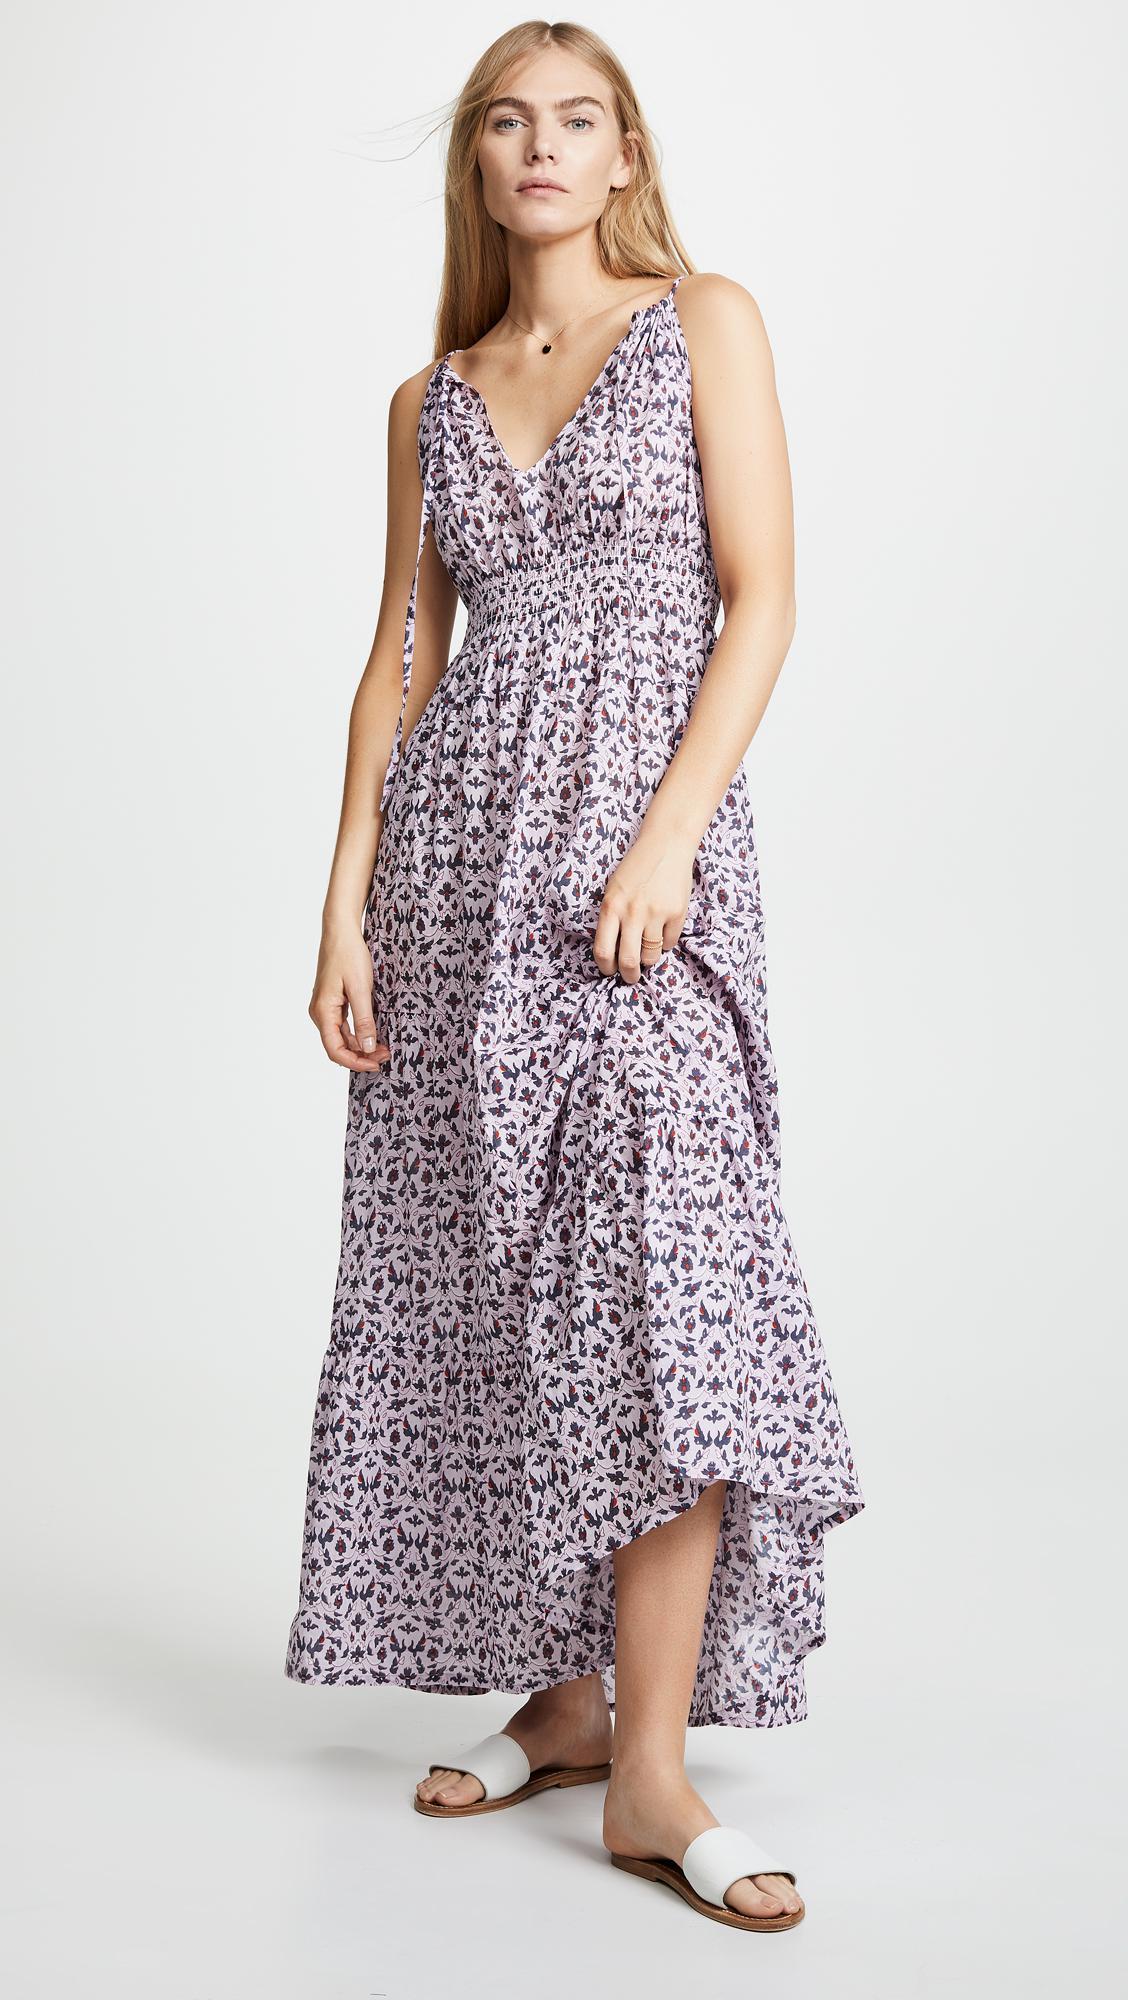 8e91d4a68 Lyst - Roberta Roller Rabbit Tran Valeria Long Dress